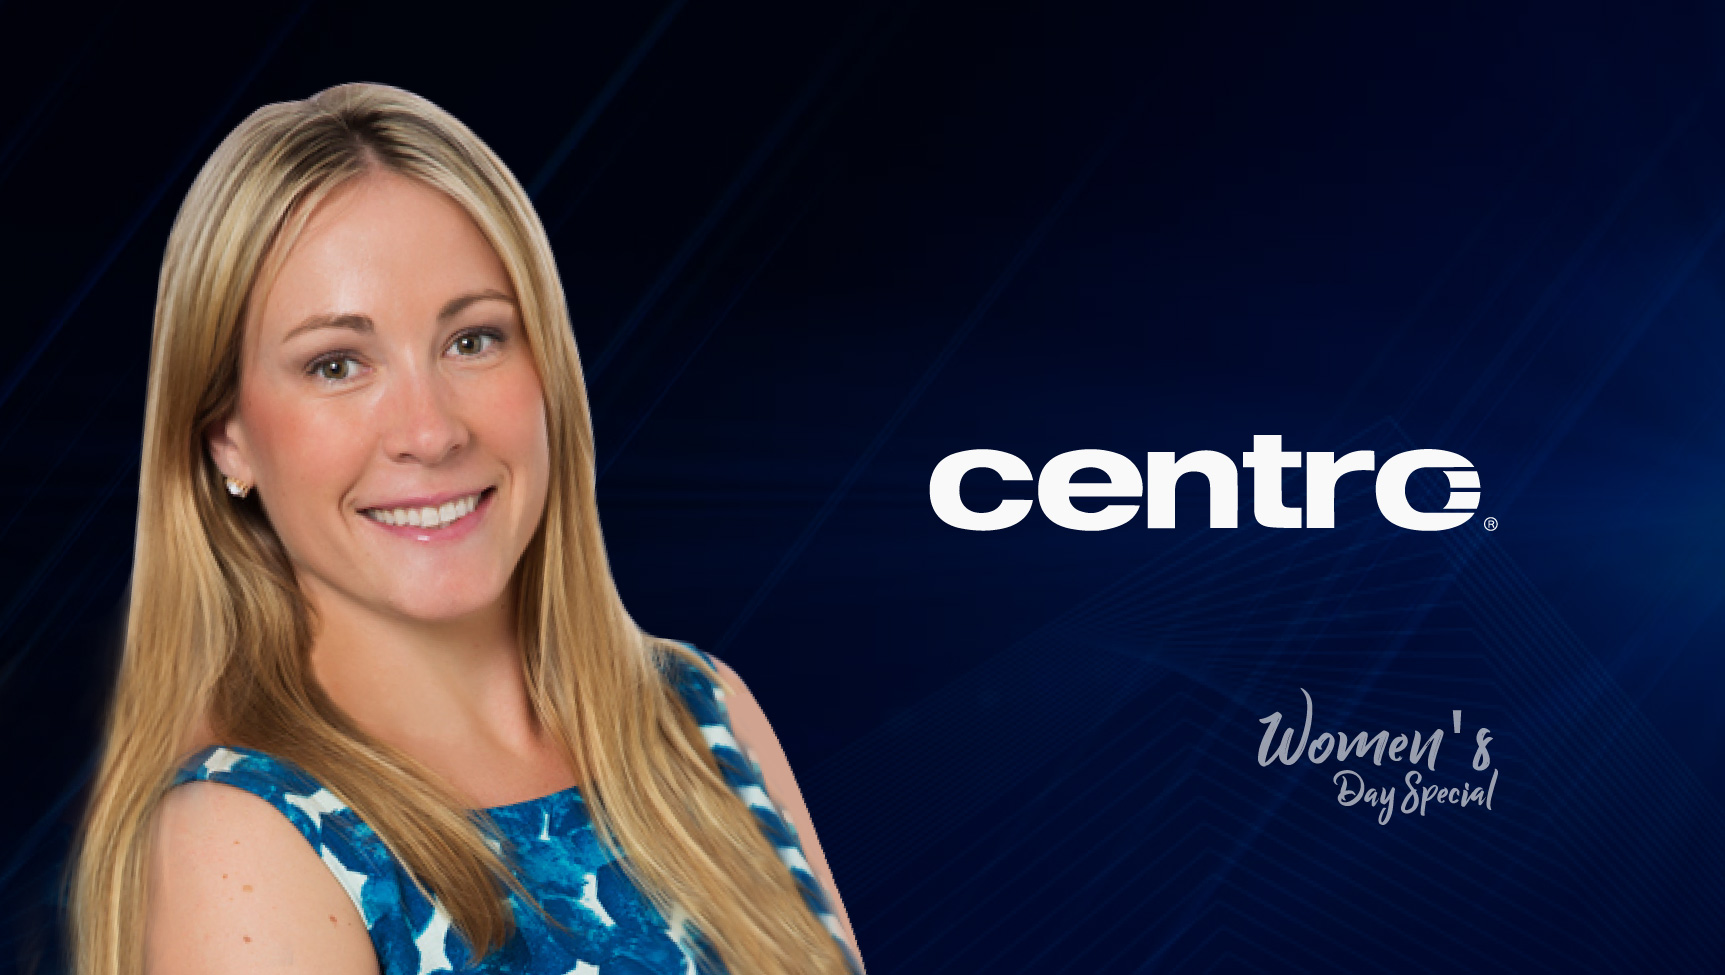 SalesTech Interview with Katie Risch, CMO at Centro